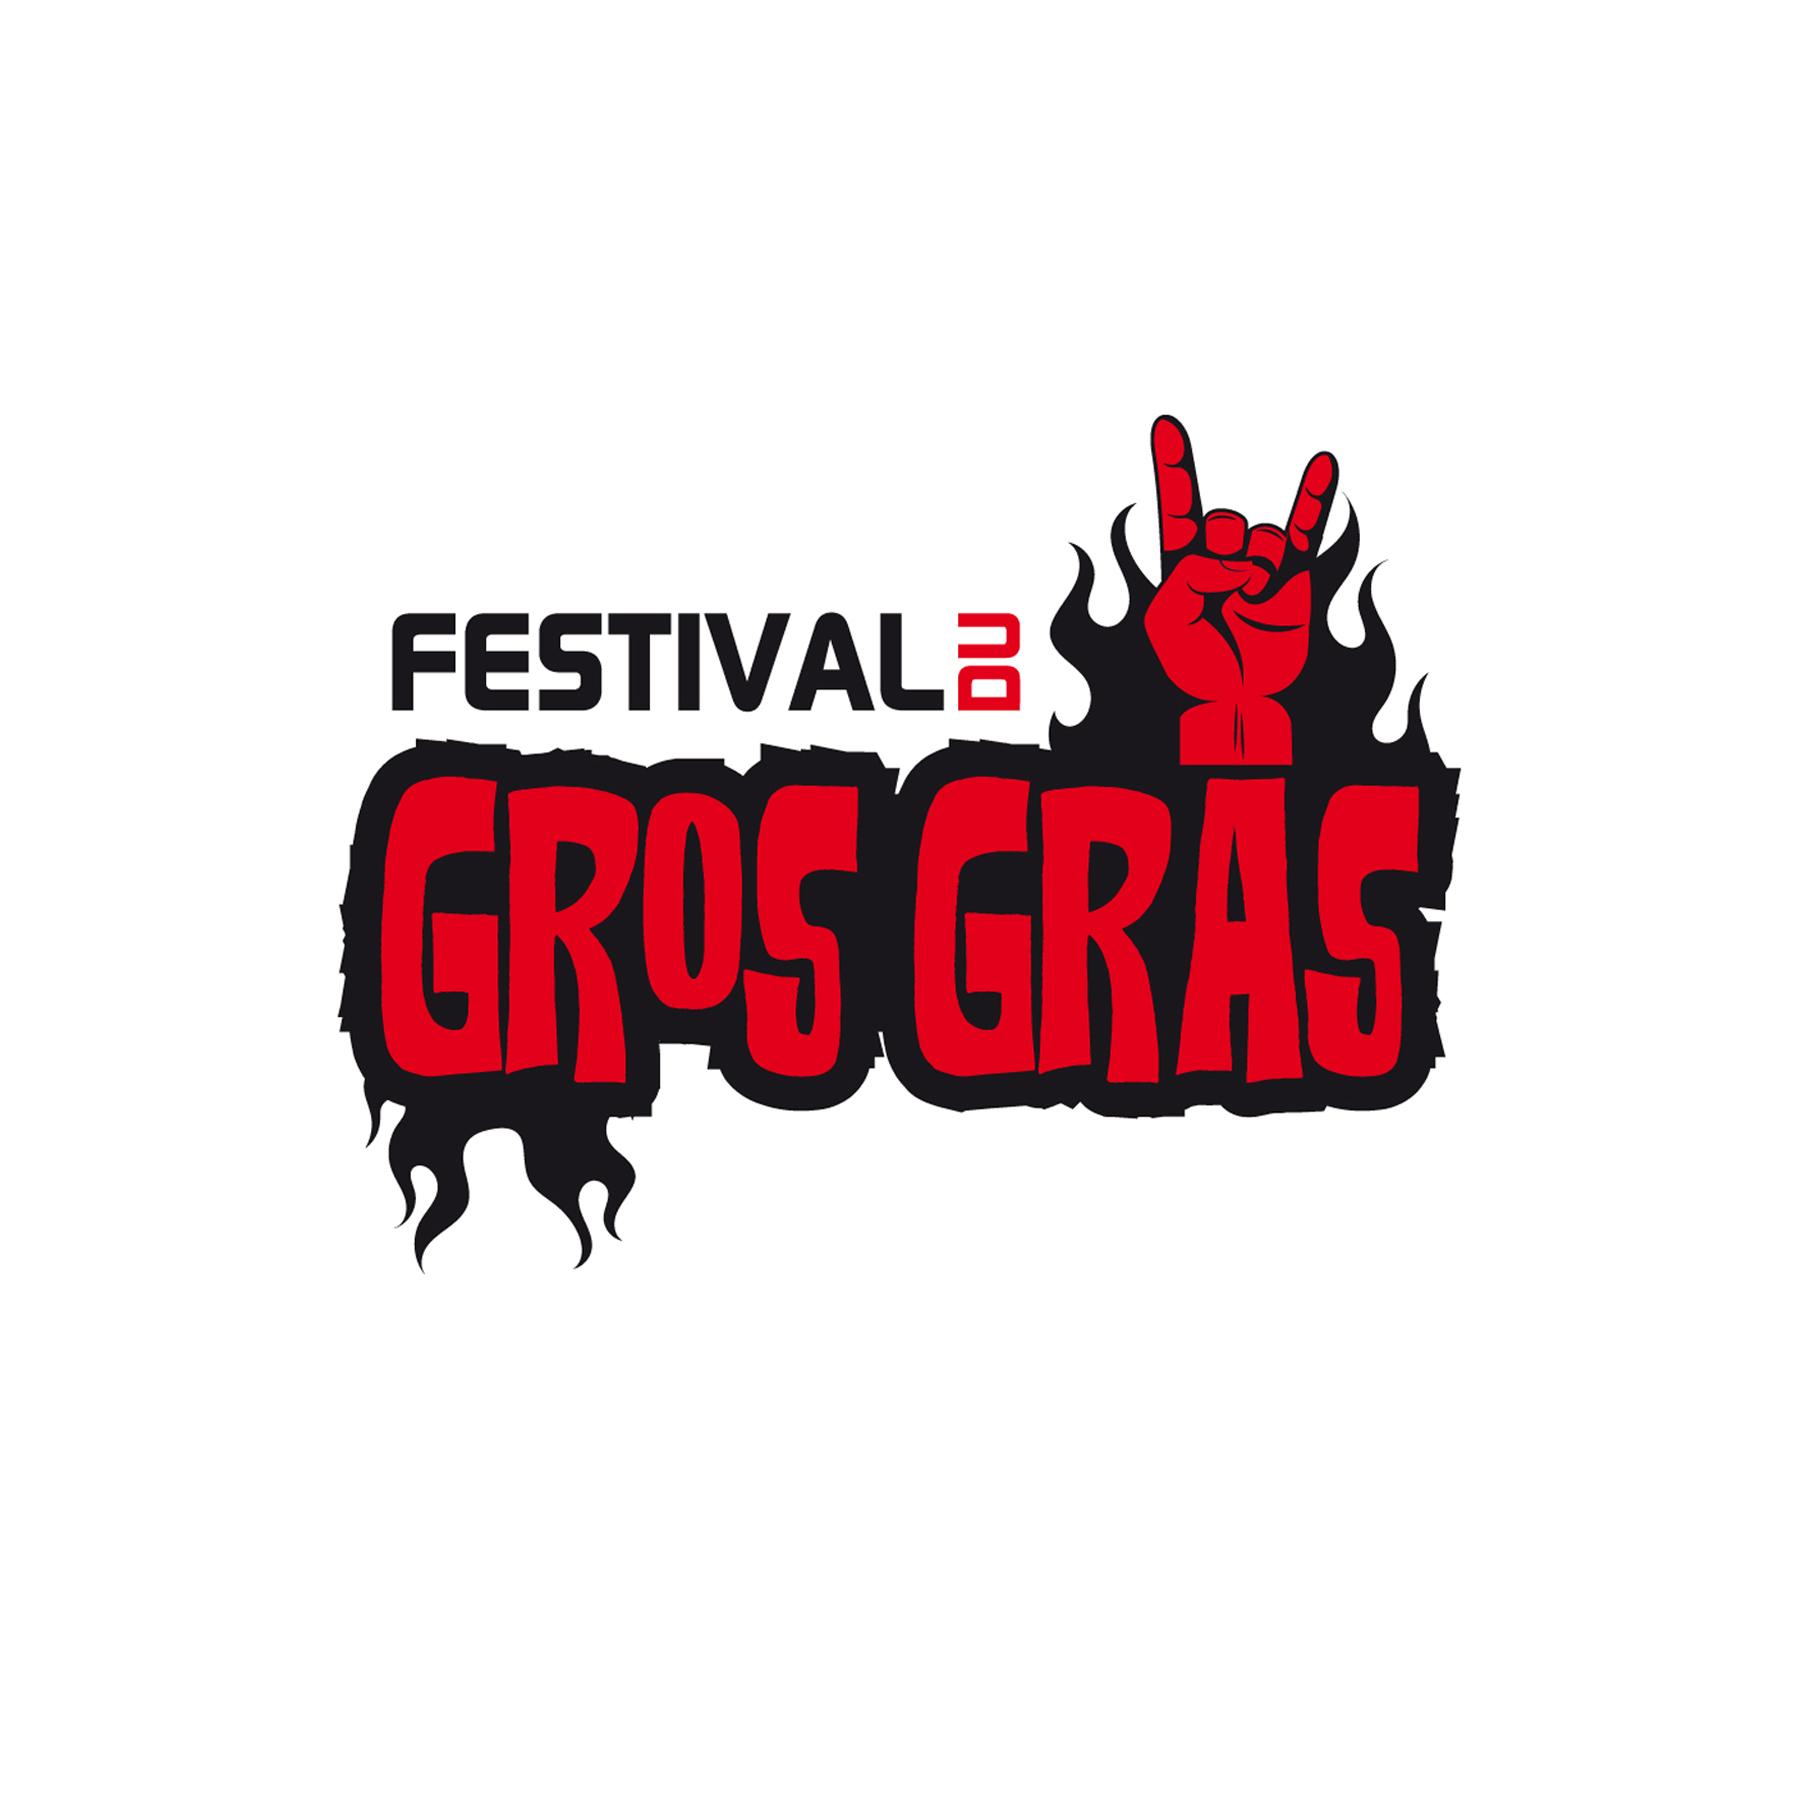 Création du logo Festival du gros gras